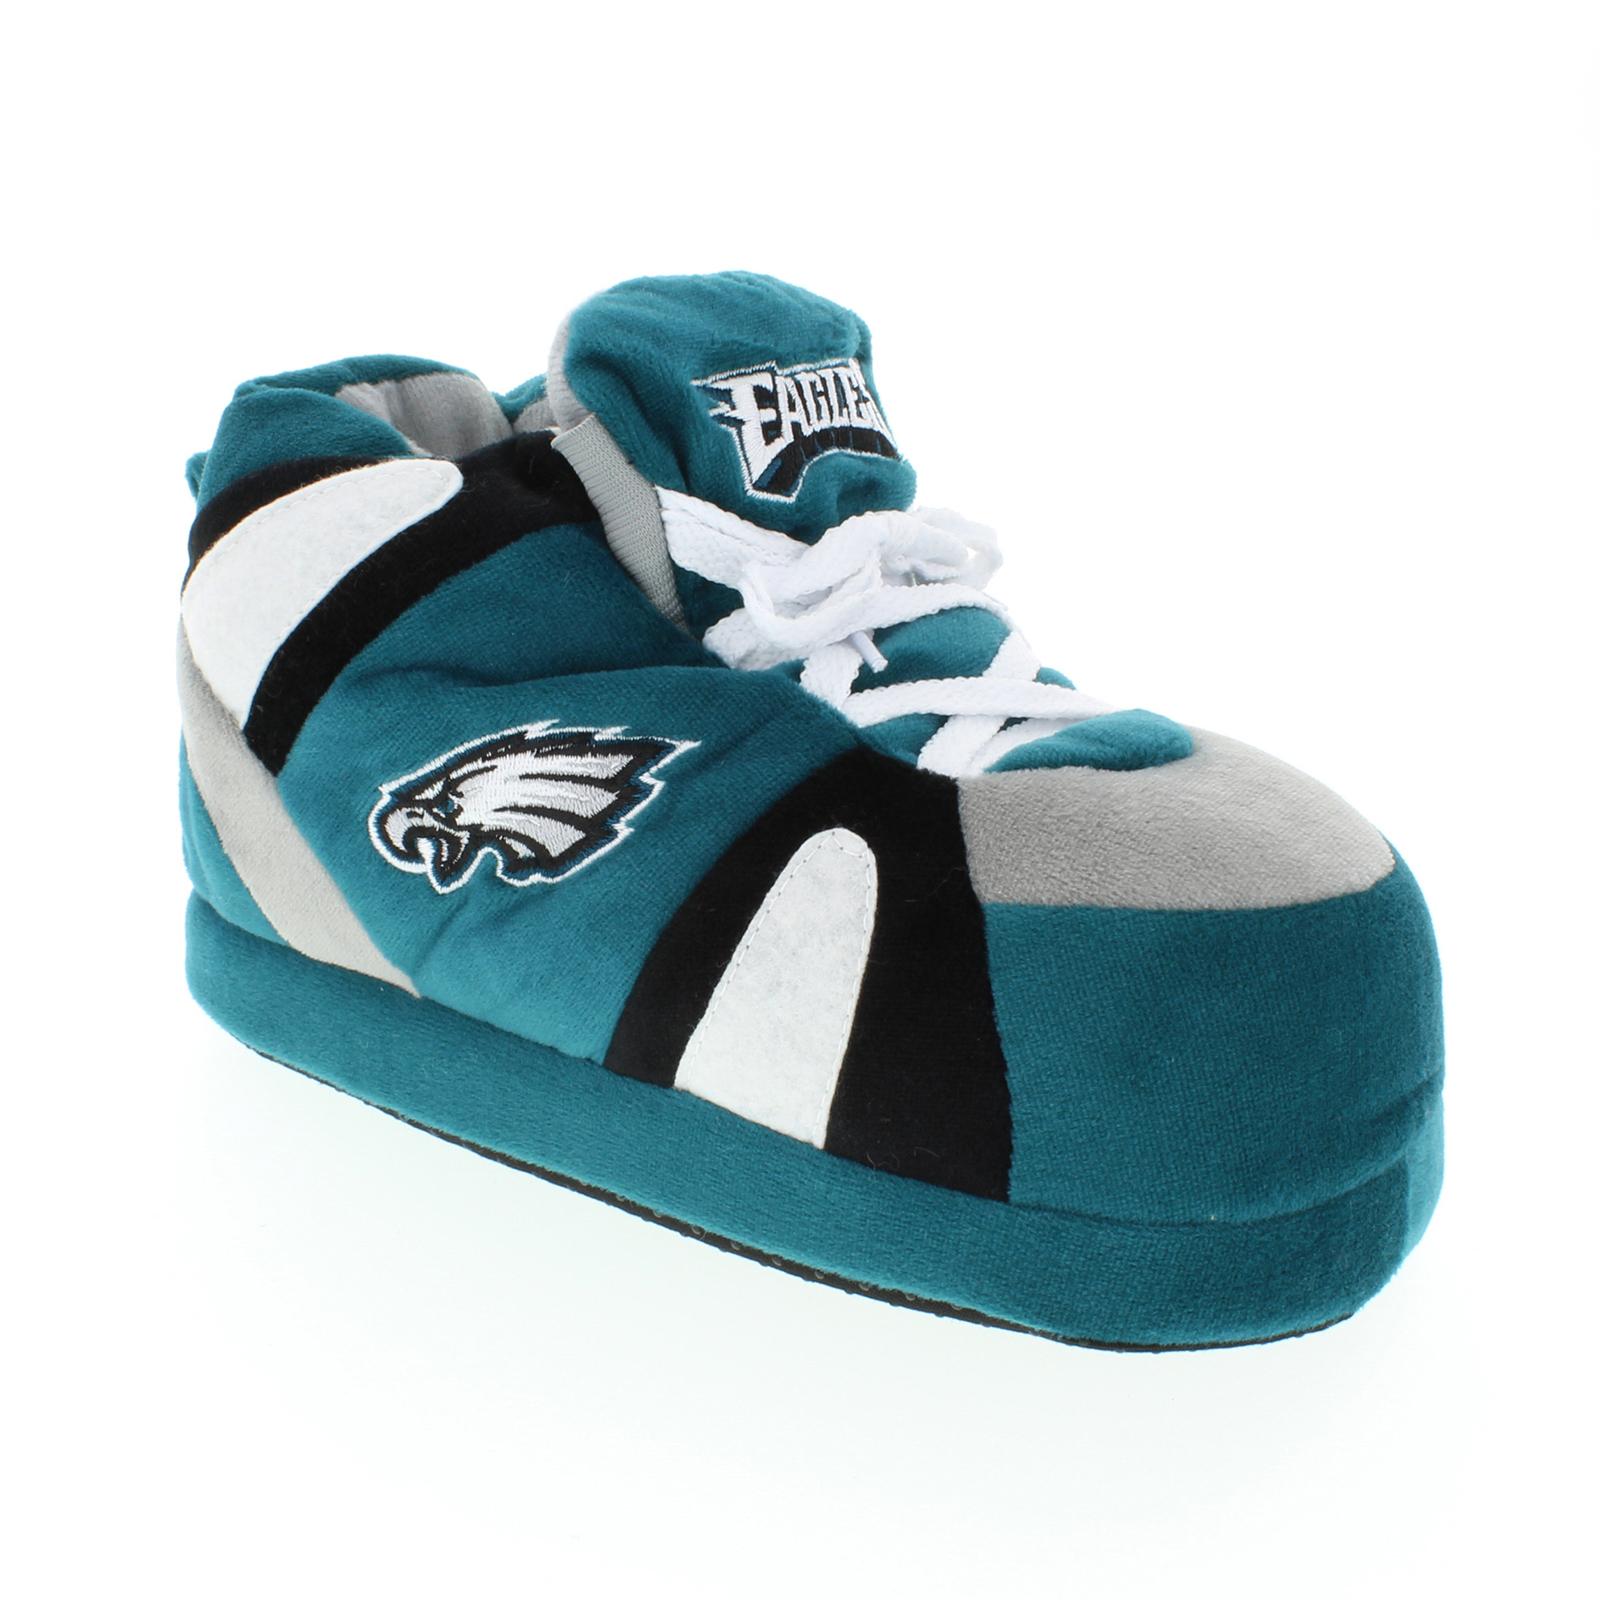 Comfy Feet NFL Philadelphia Eagles Small Slipper PartNumber: 080V003115895000P KsnValue: 3115895 MfgPartNumber: 184465